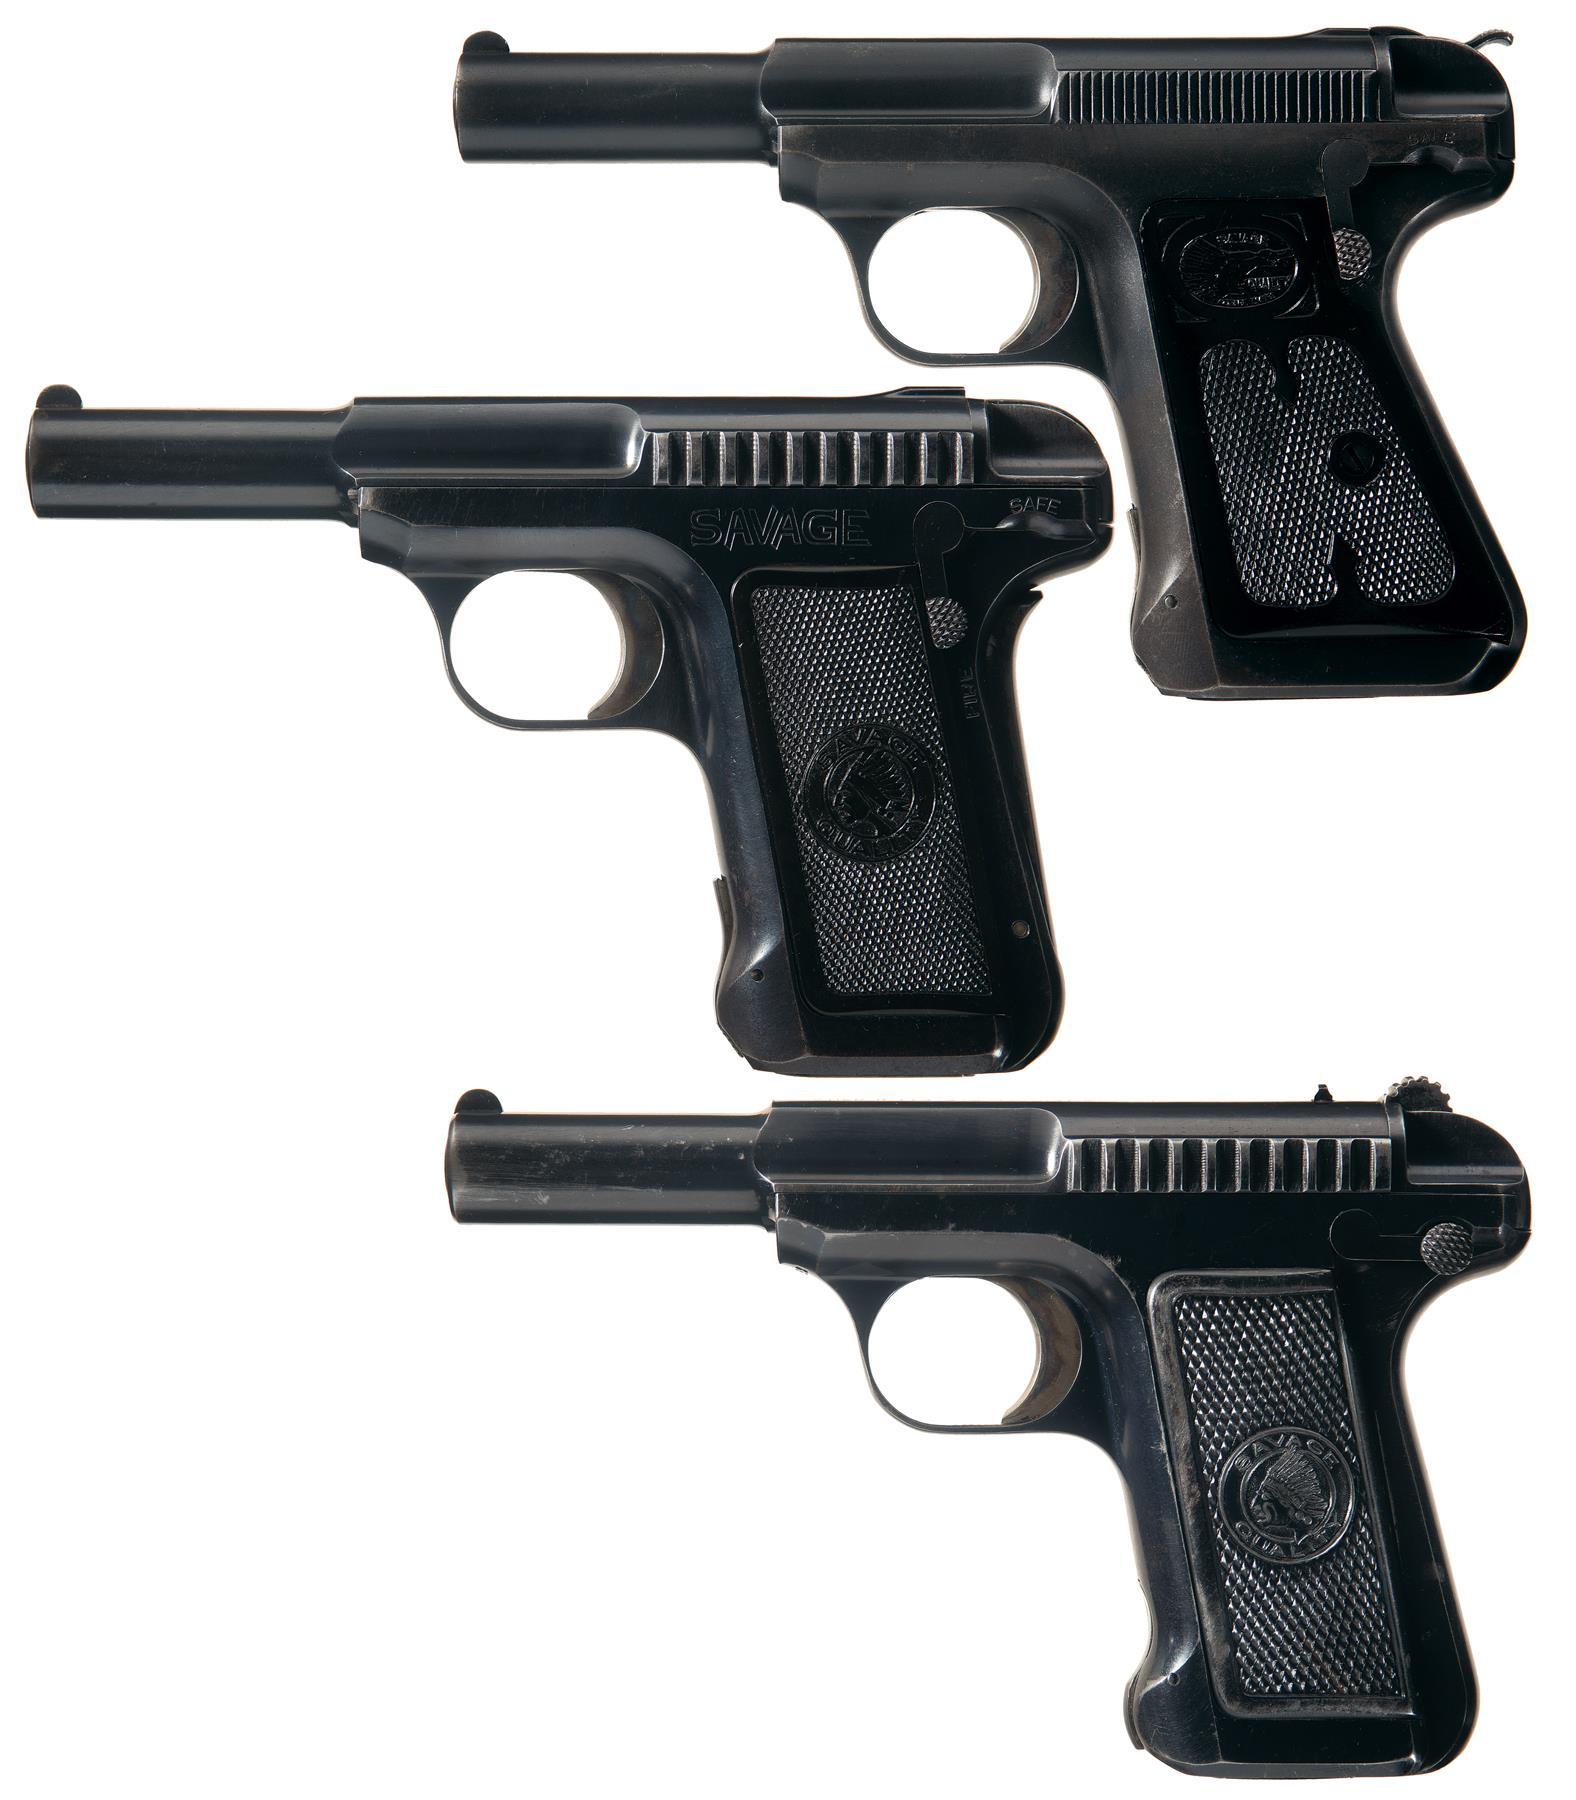 Three Savage Semi-Automatic Pistols